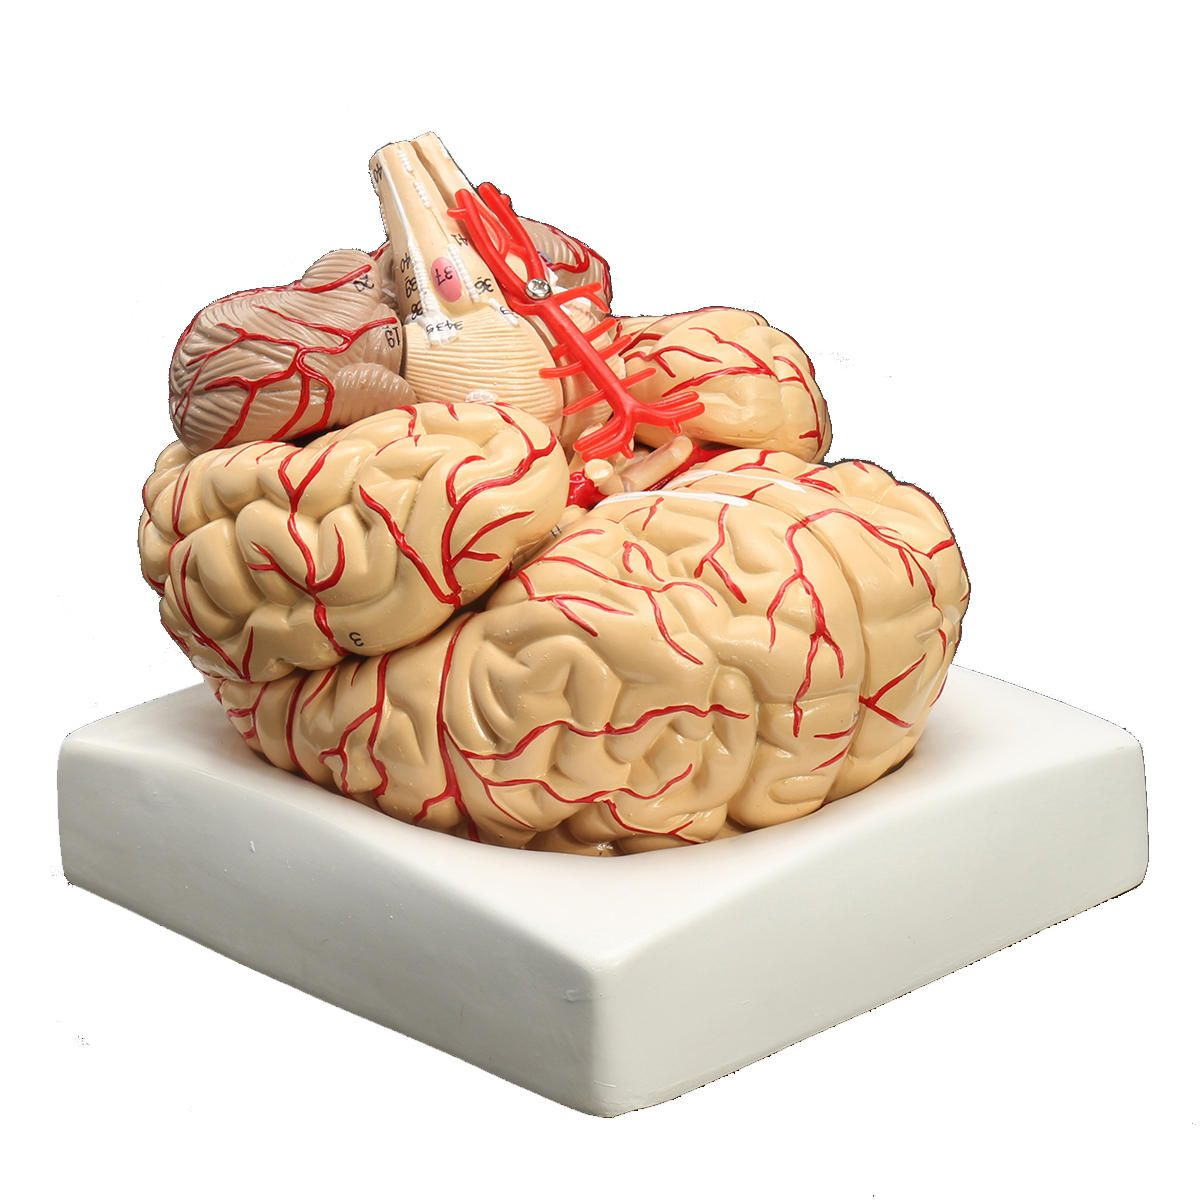 US$28.99] Disassembled Human Brain Model Medical Life Size ...